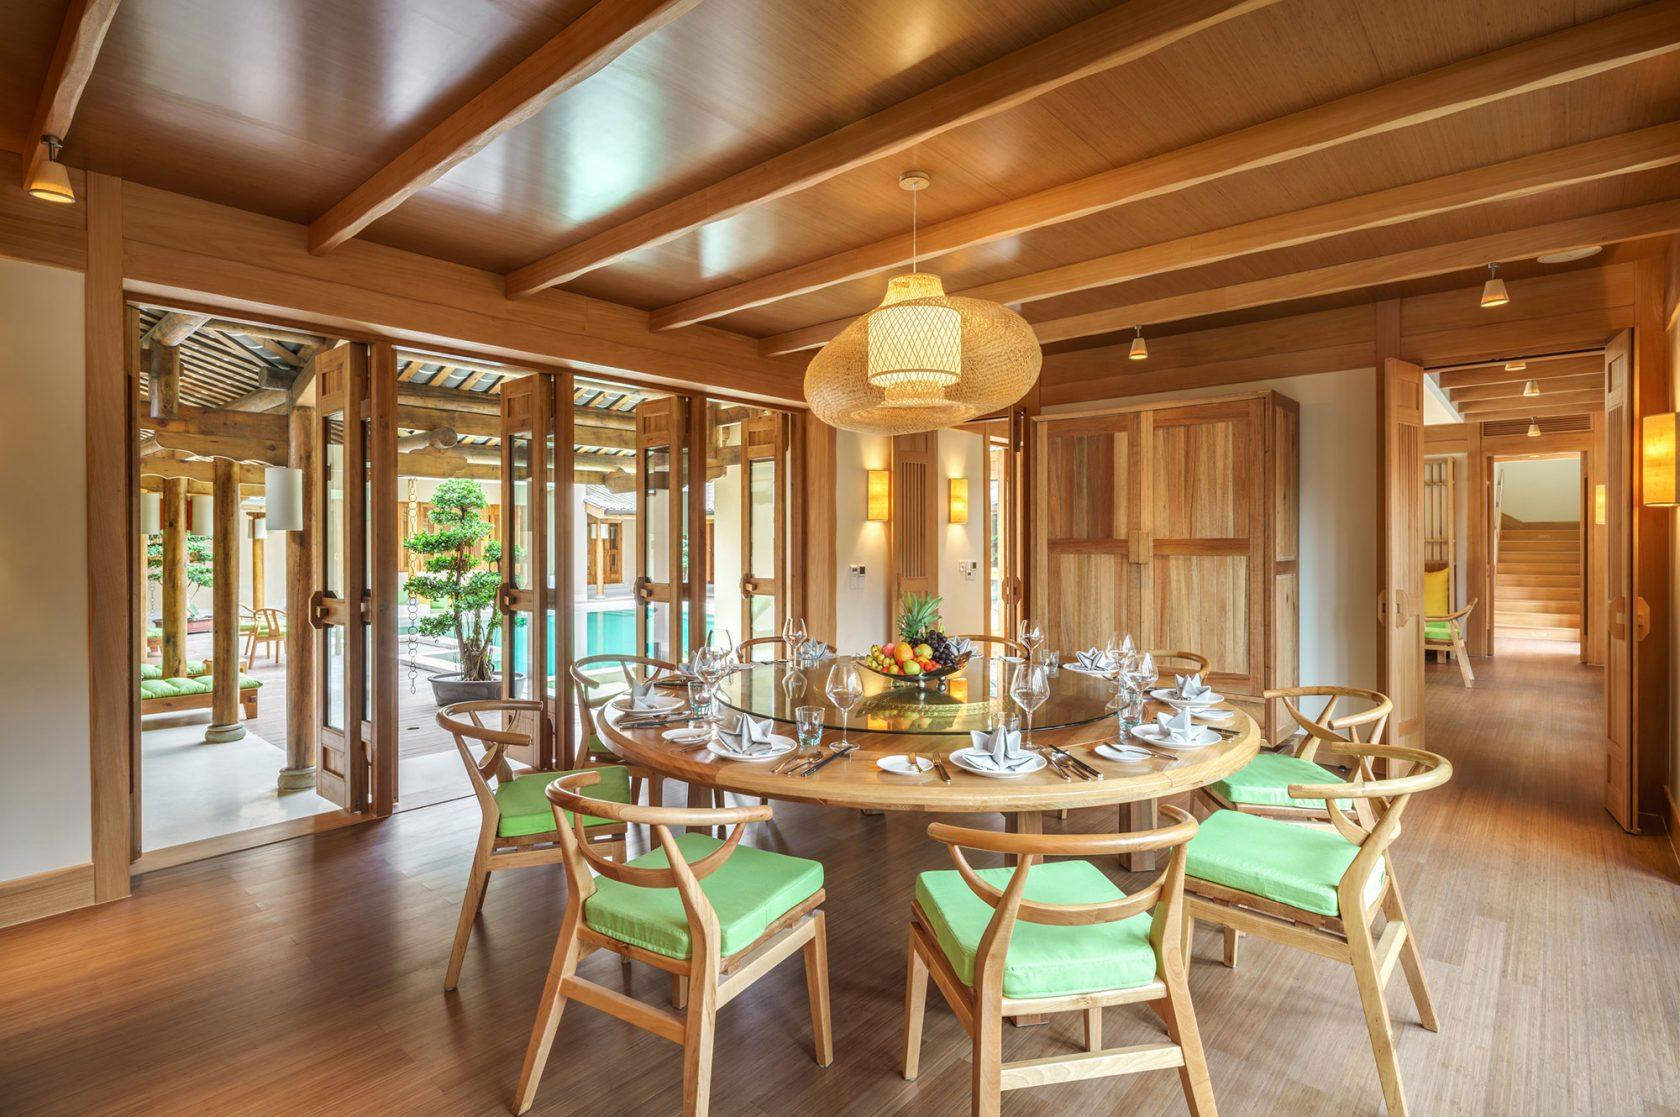 Six Senses Qing Cheng Mountain Presidential Villa Dining Room